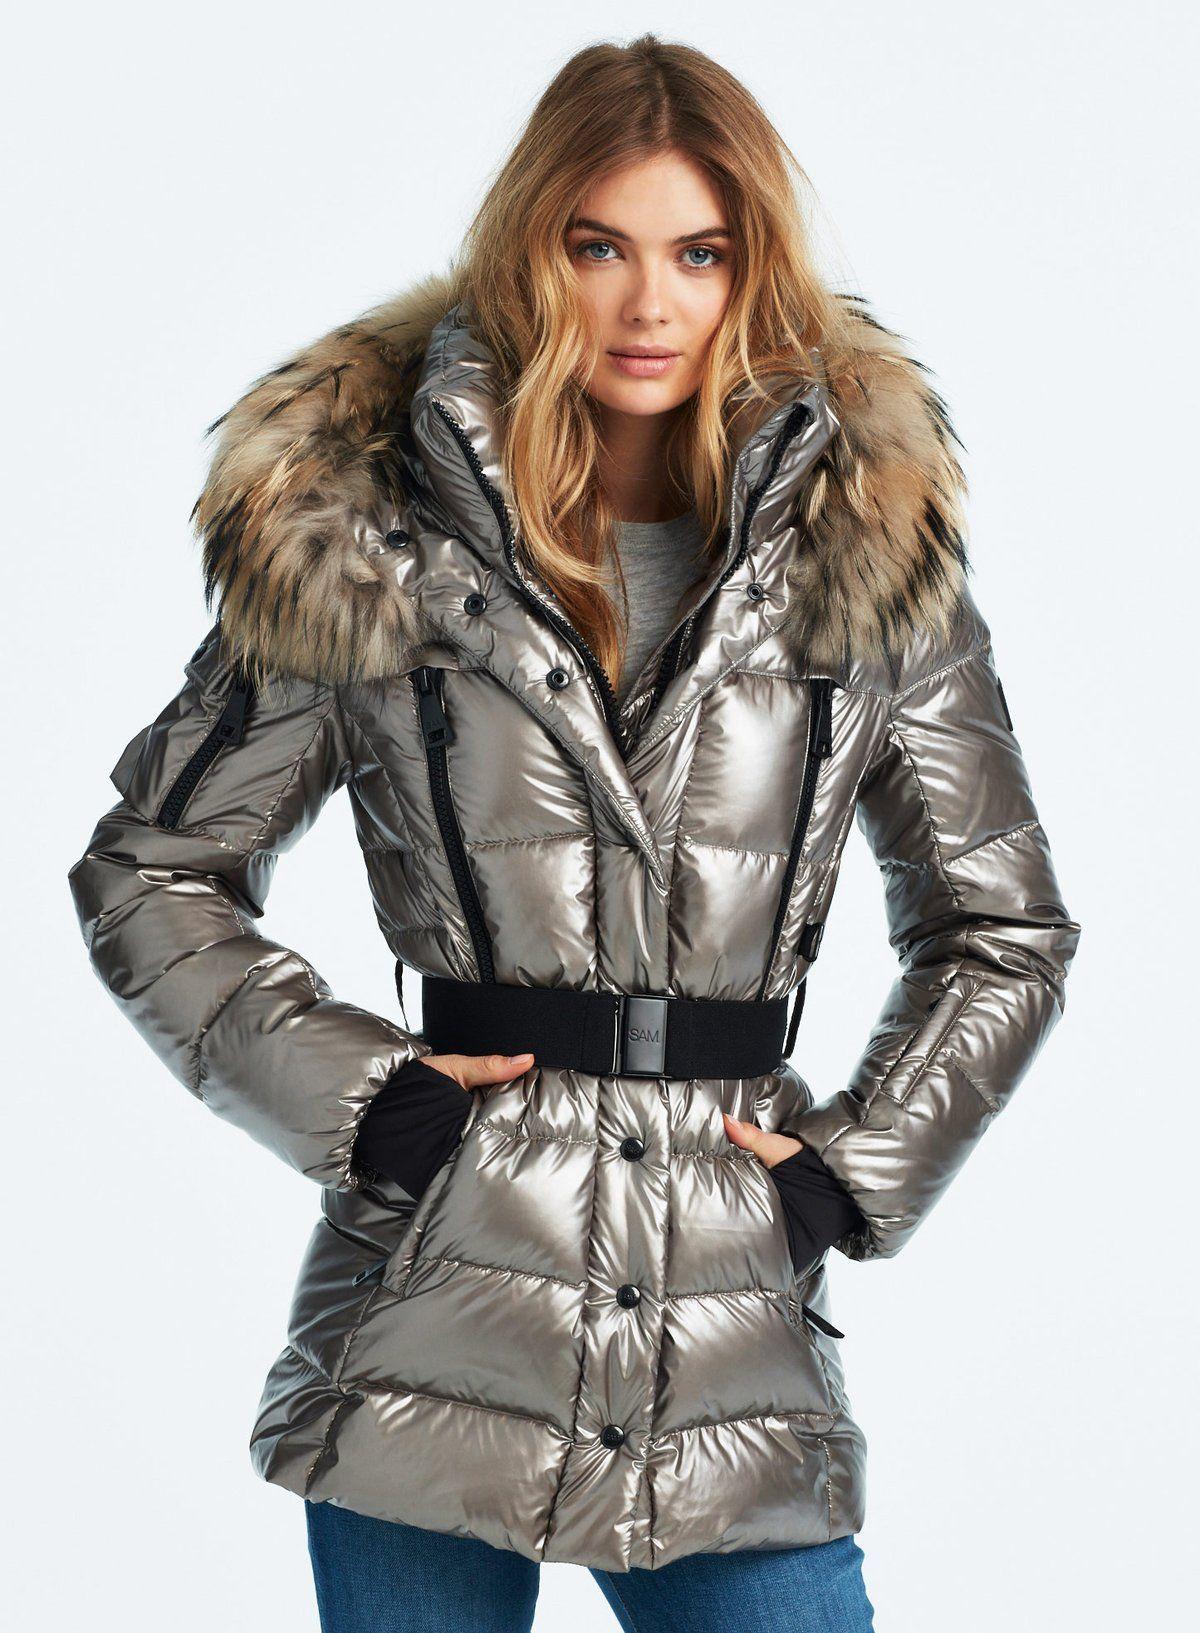 Millennium Gunmetal Stylish Outerwear Puffer Jacket Women Leather Jackets Women [ 1633 x 1200 Pixel ]